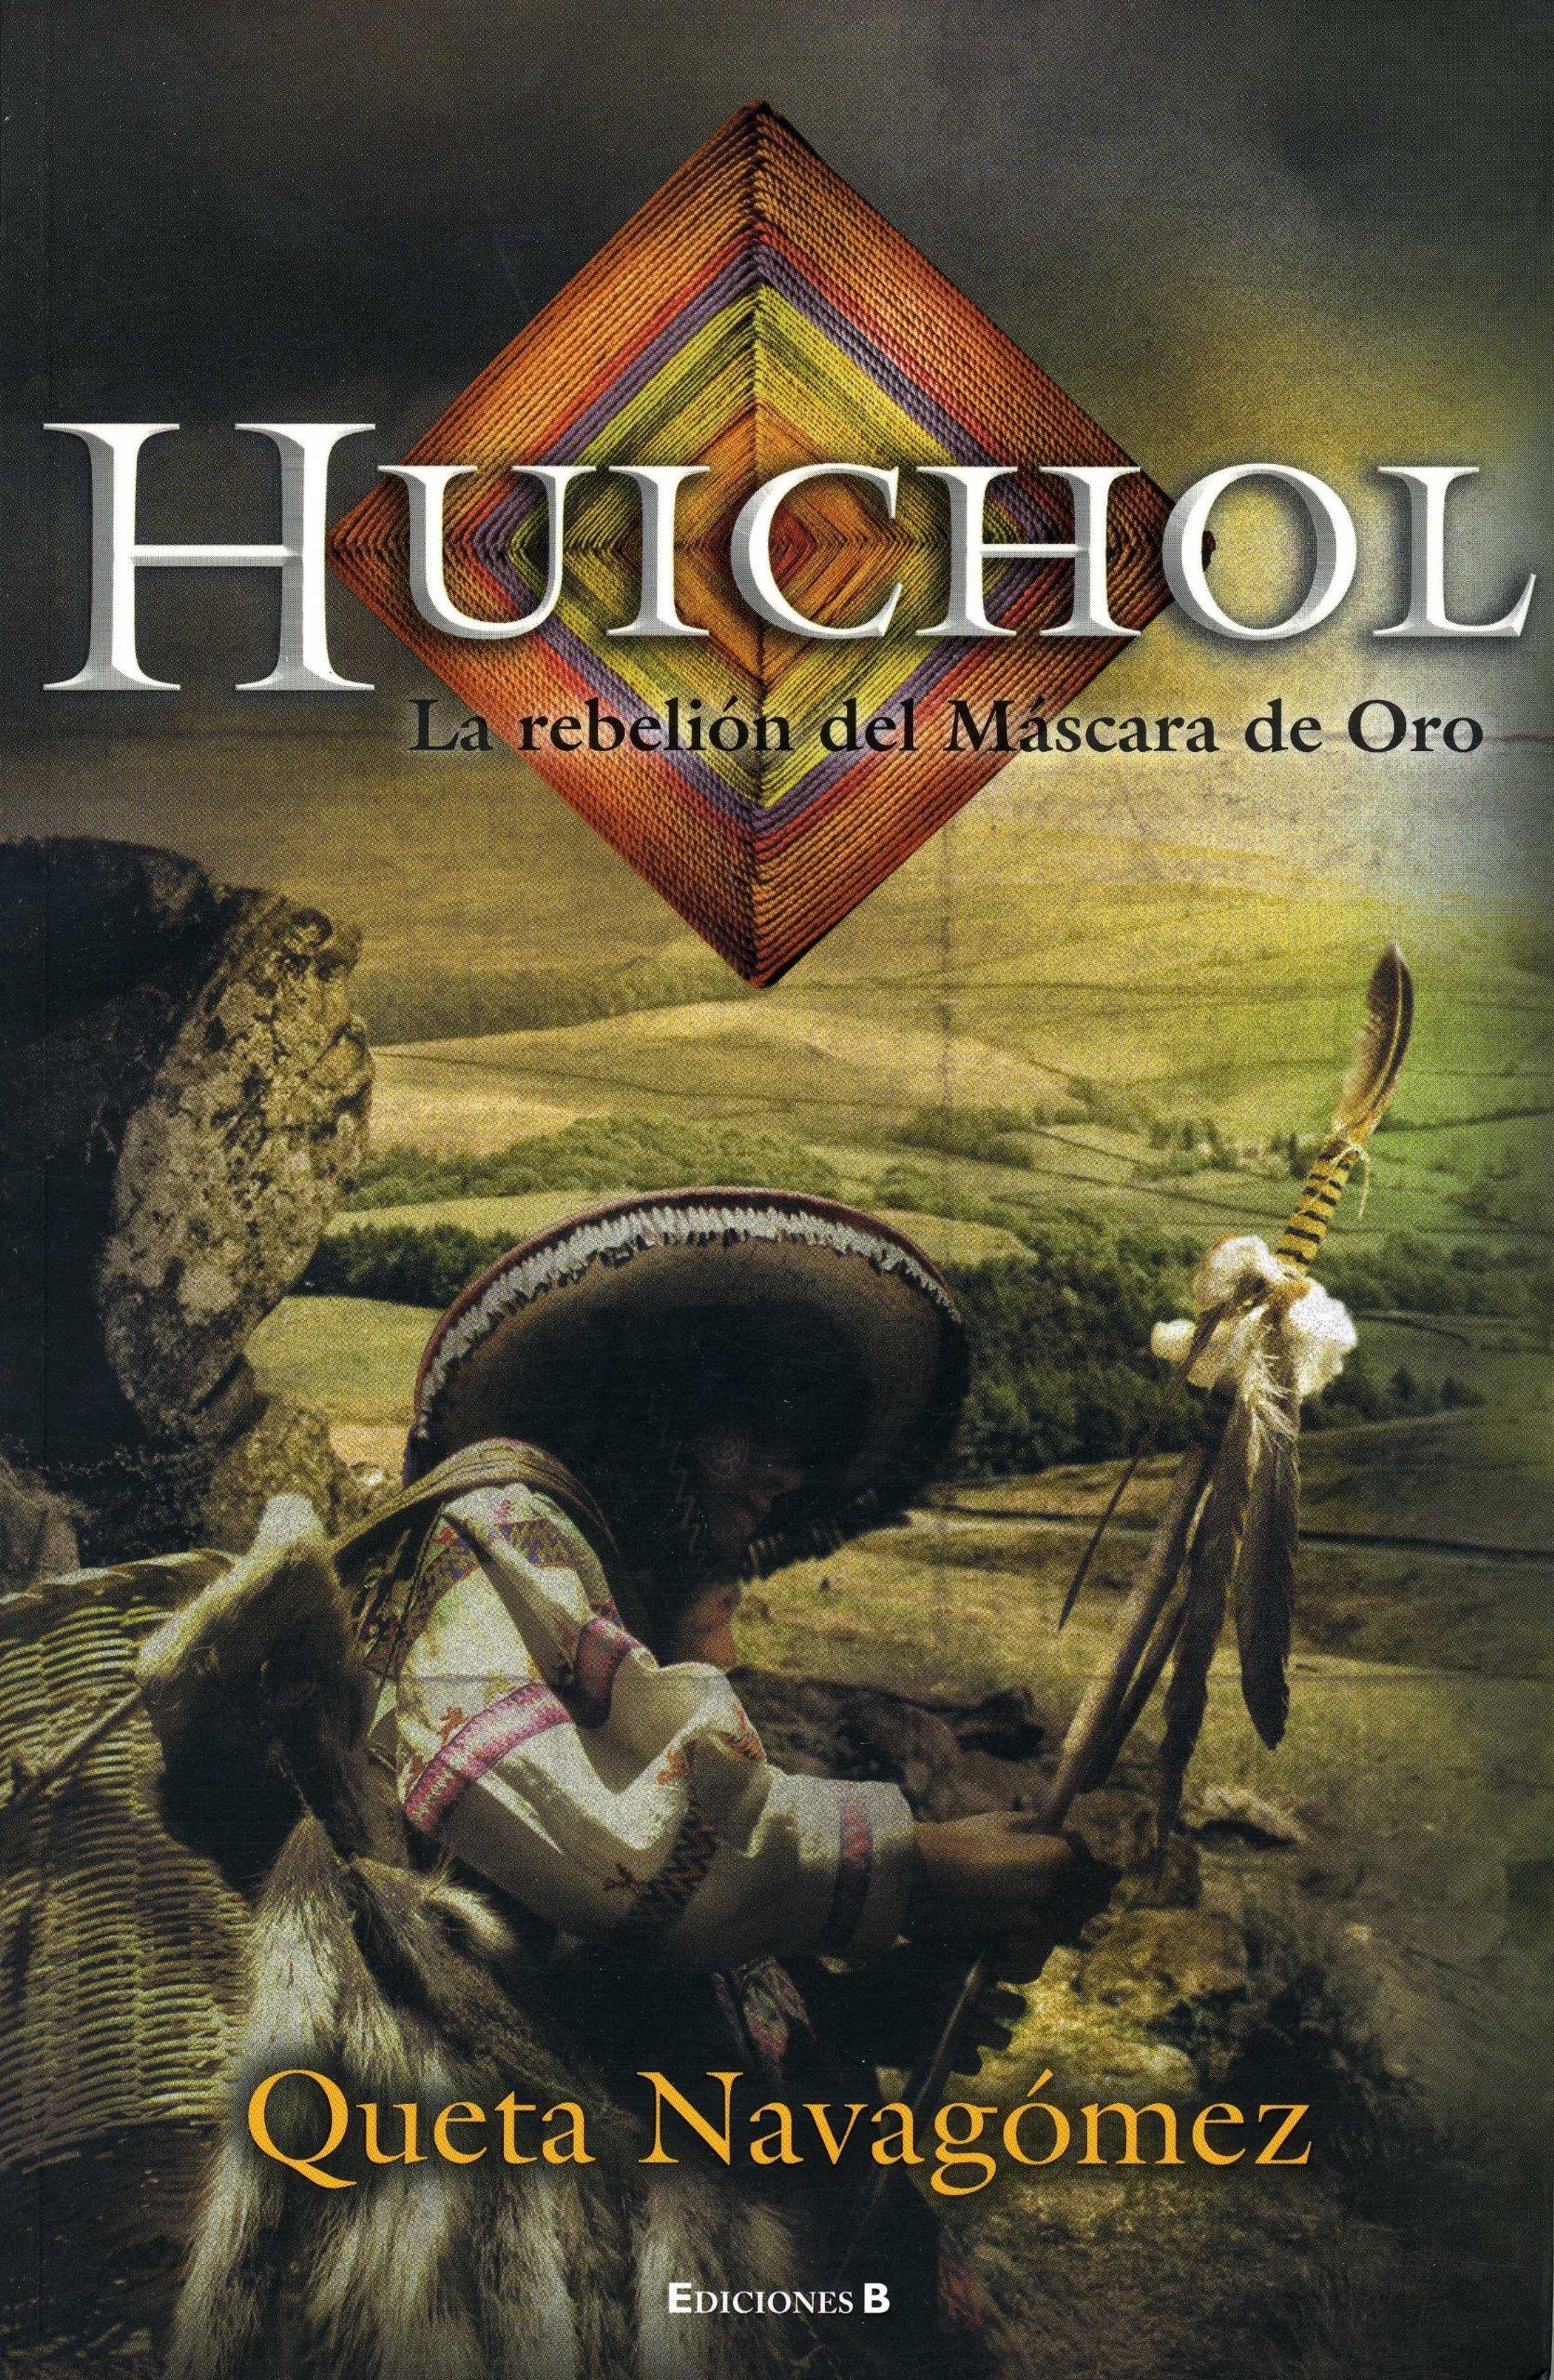 Huichol (Spanish Edition) (Historica (Ediciones B)) (Spanish) Paperback – April 15, 2011